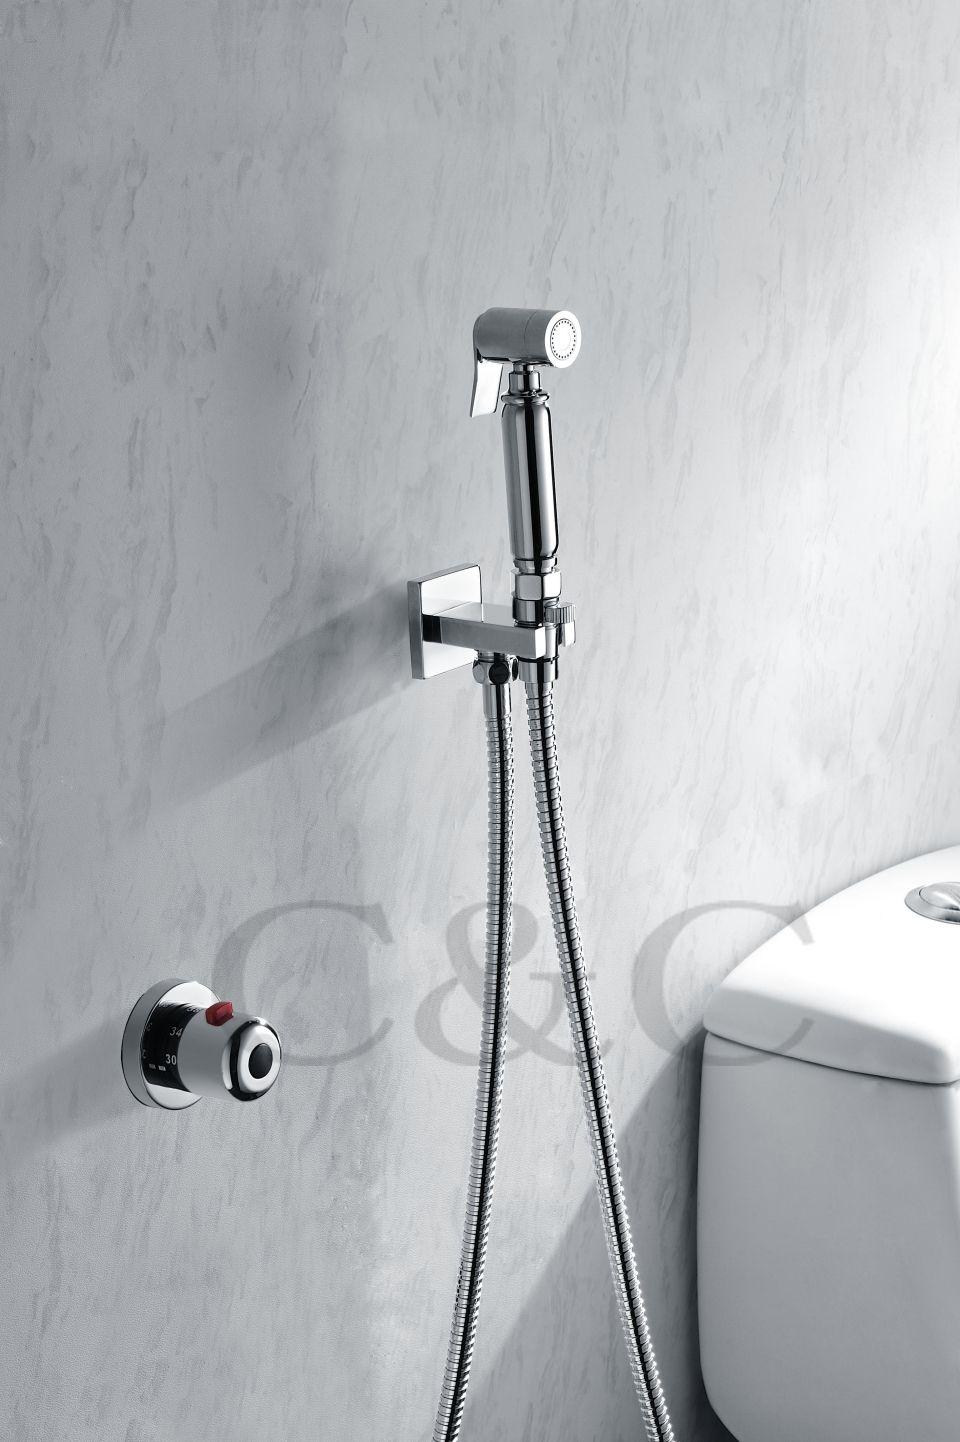 Nastennyj Ruchnoj Shattaf Bide Tualet Sprej Dush 150 Sm Iz Nerzhaveyushej Stali Shlang S Termostaticheskij Sme Bidet Faucets Bath Shower Mixer Taps Shower Faucet Sets